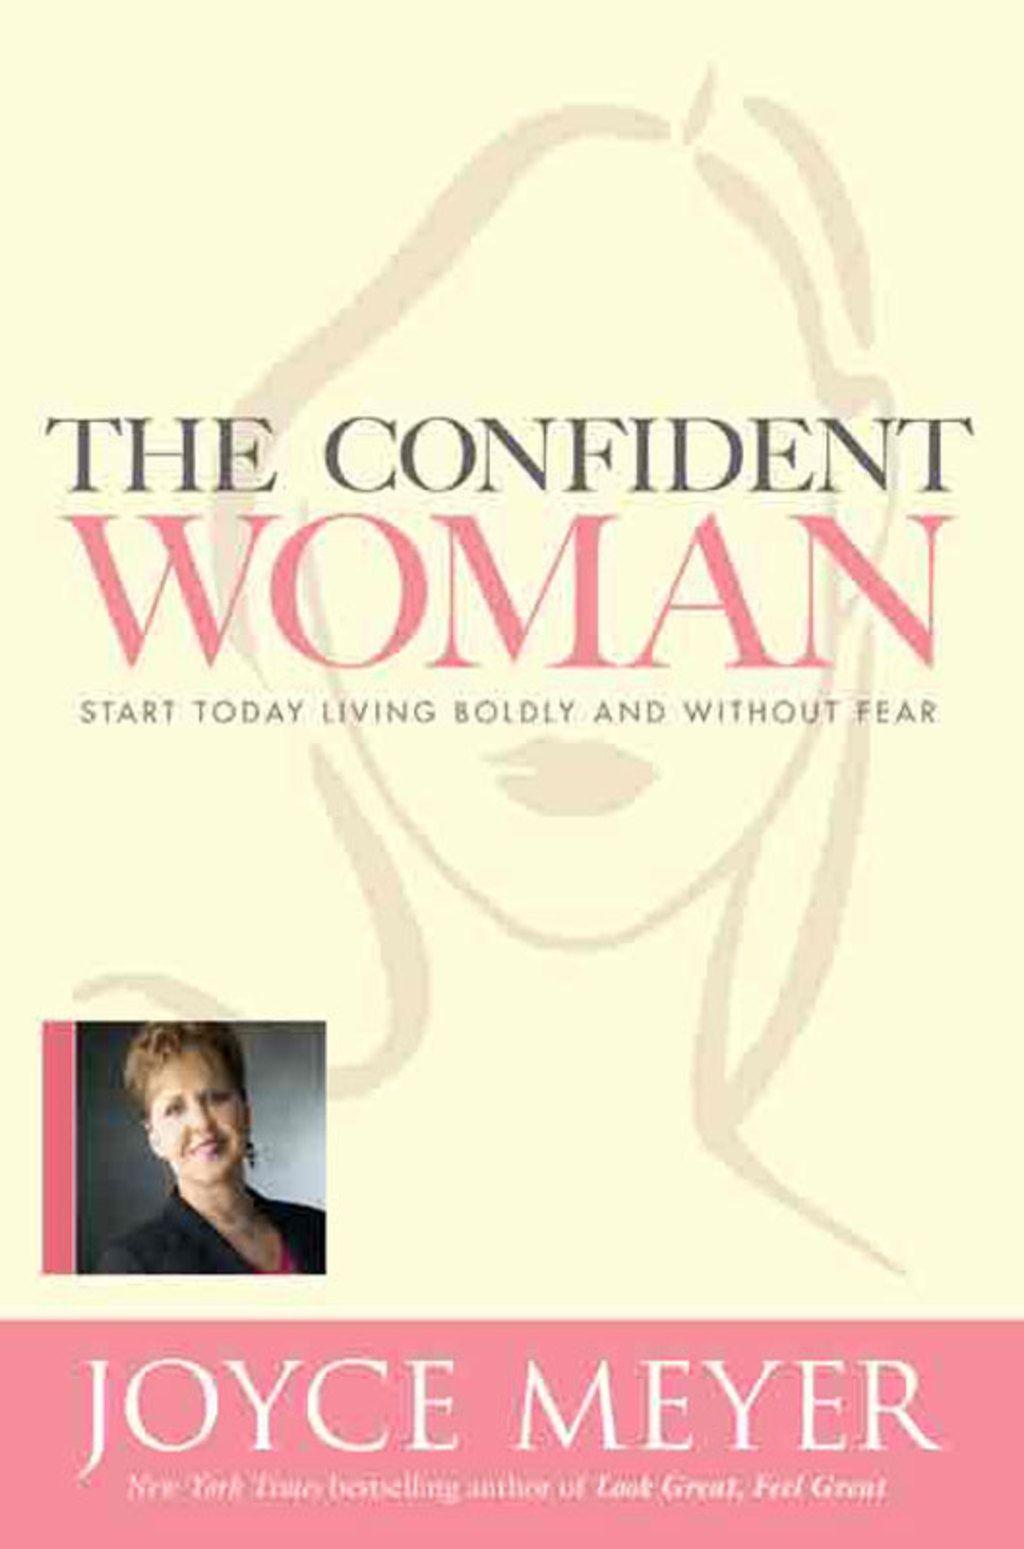 The Confident Woman Ebook In 2020 Confident Woman Joyce Meyer